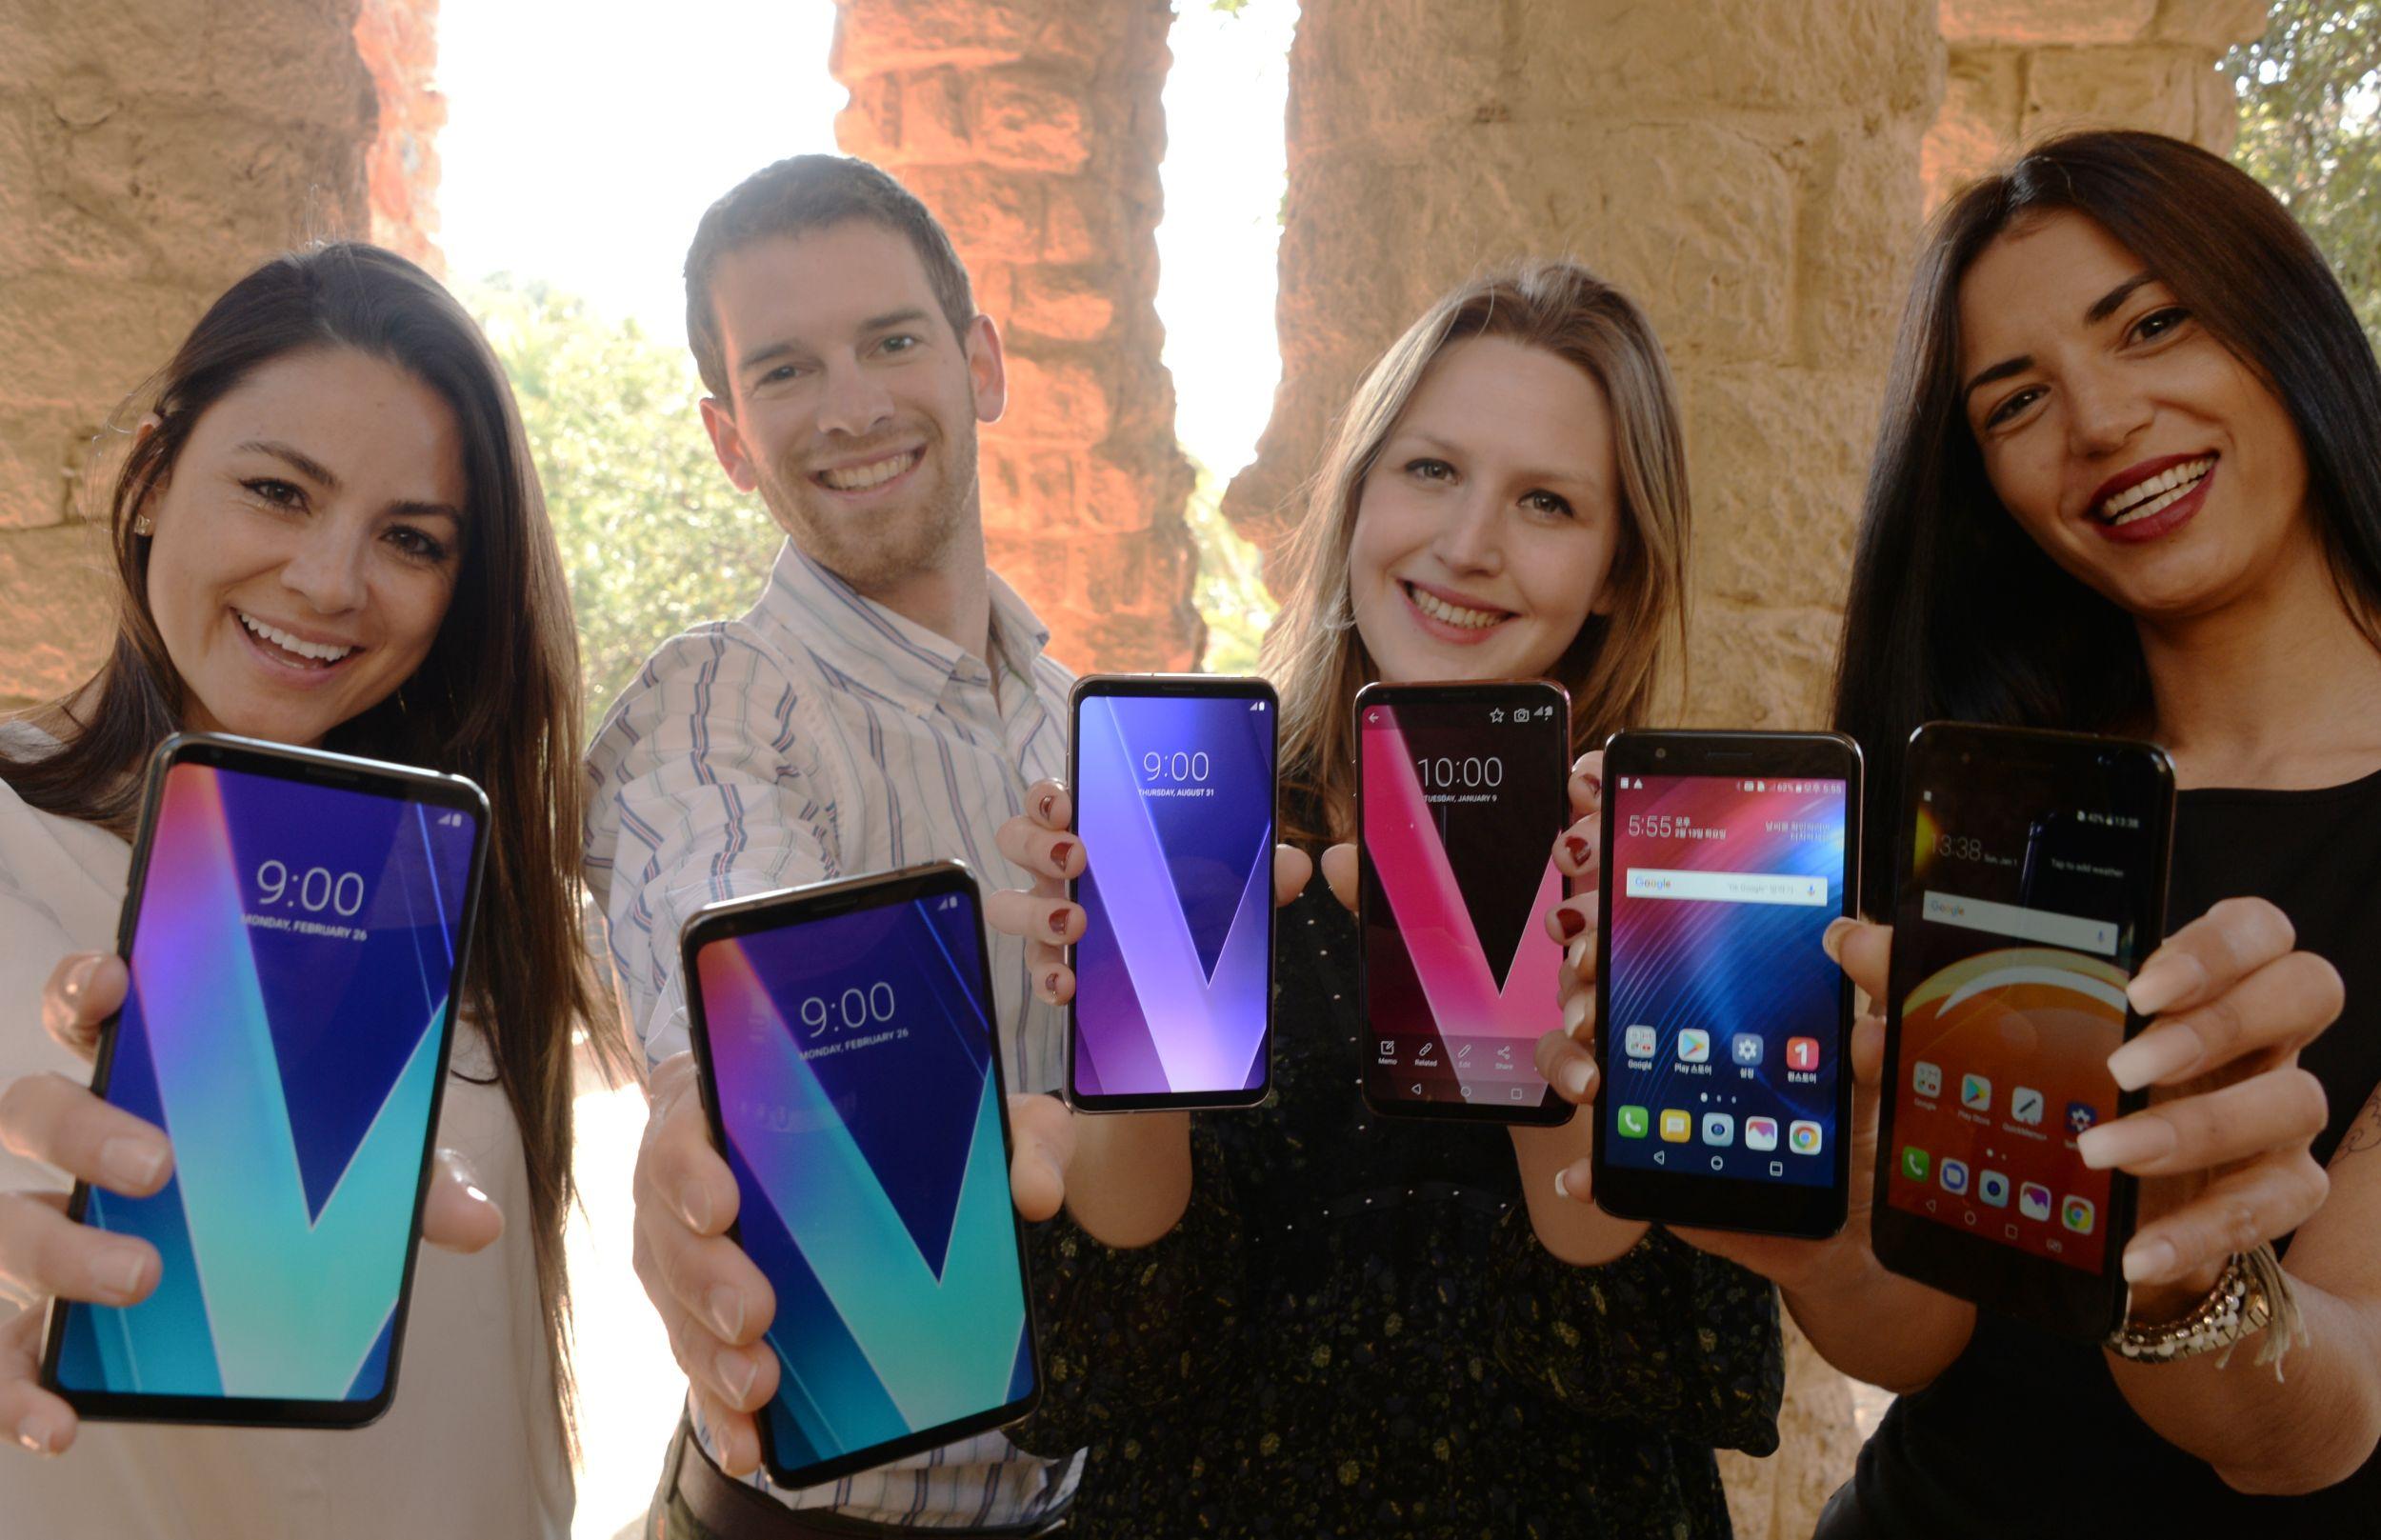 MWC 2018에 참가하는 LG 스마트폰